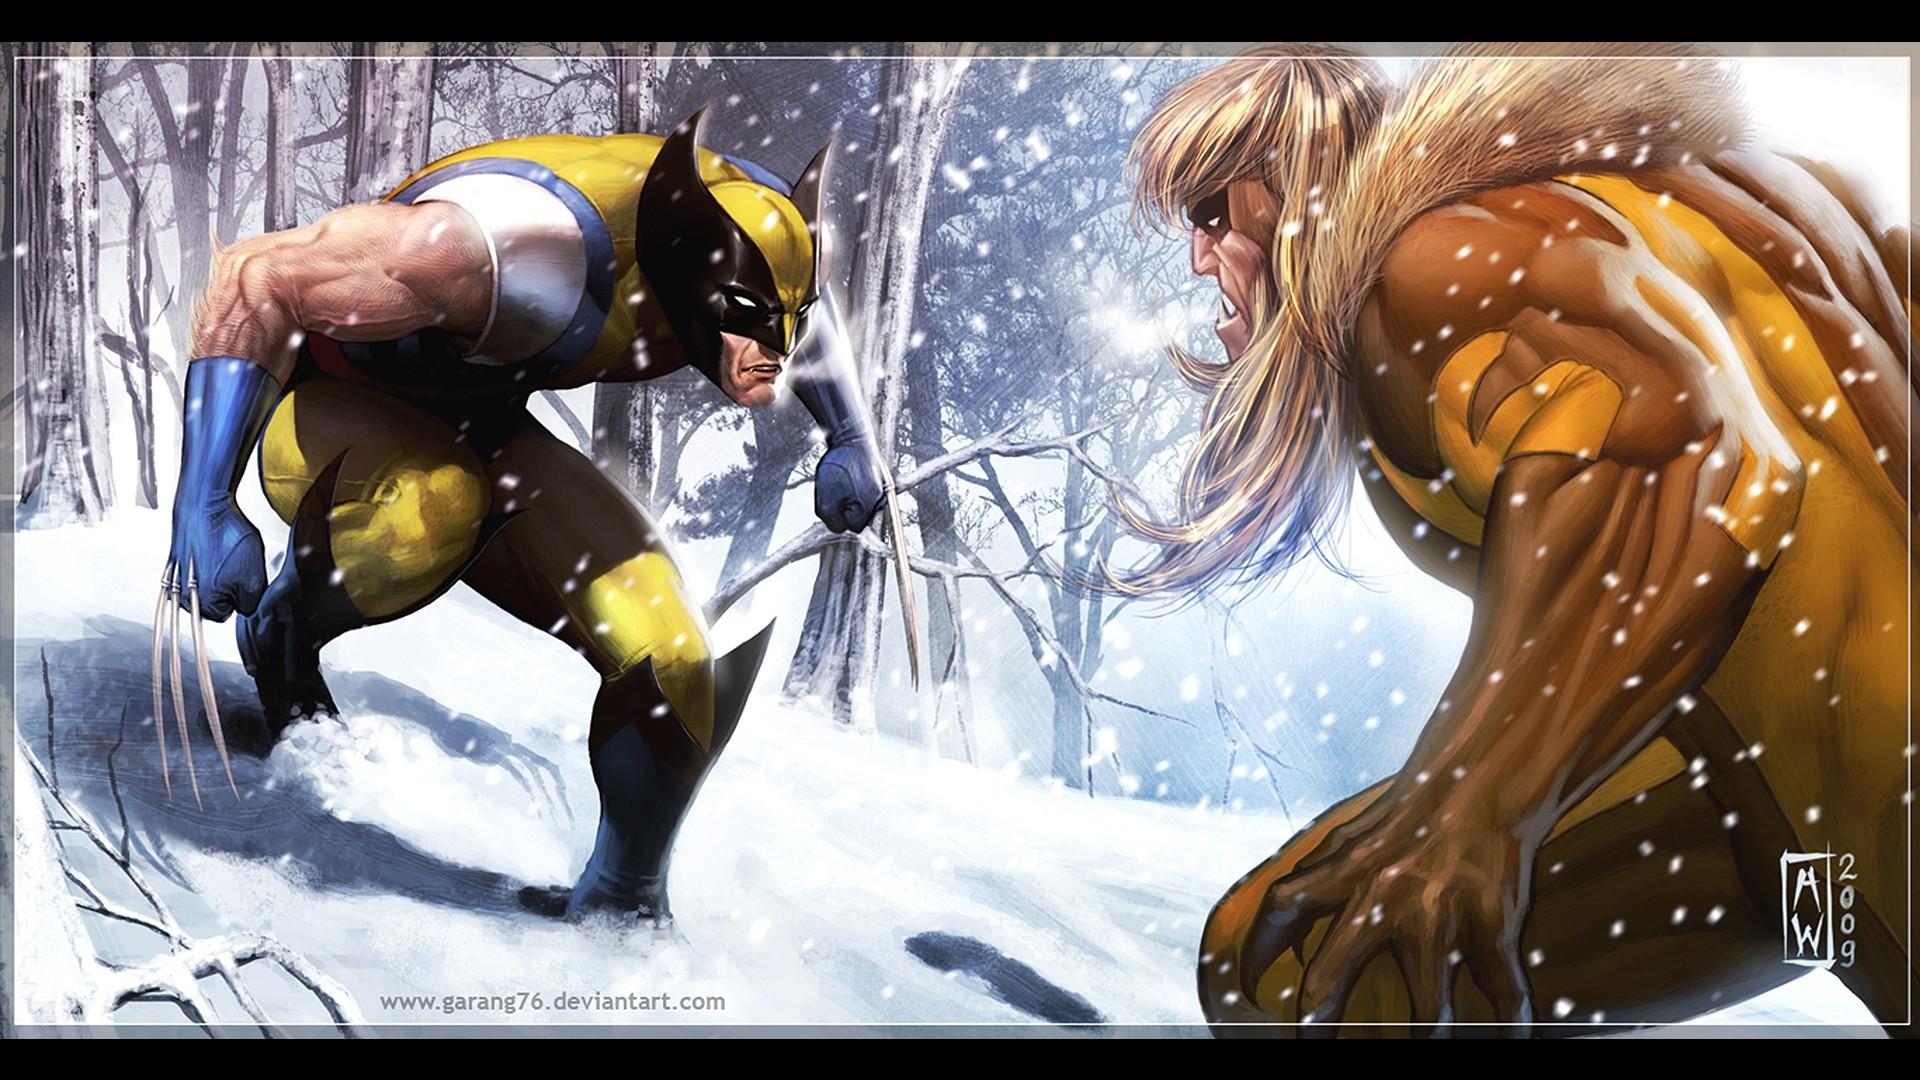 Res: 1920x1080, Wolverine Marvel superhero f wallpaper |  | 133073 | WallpaperUP